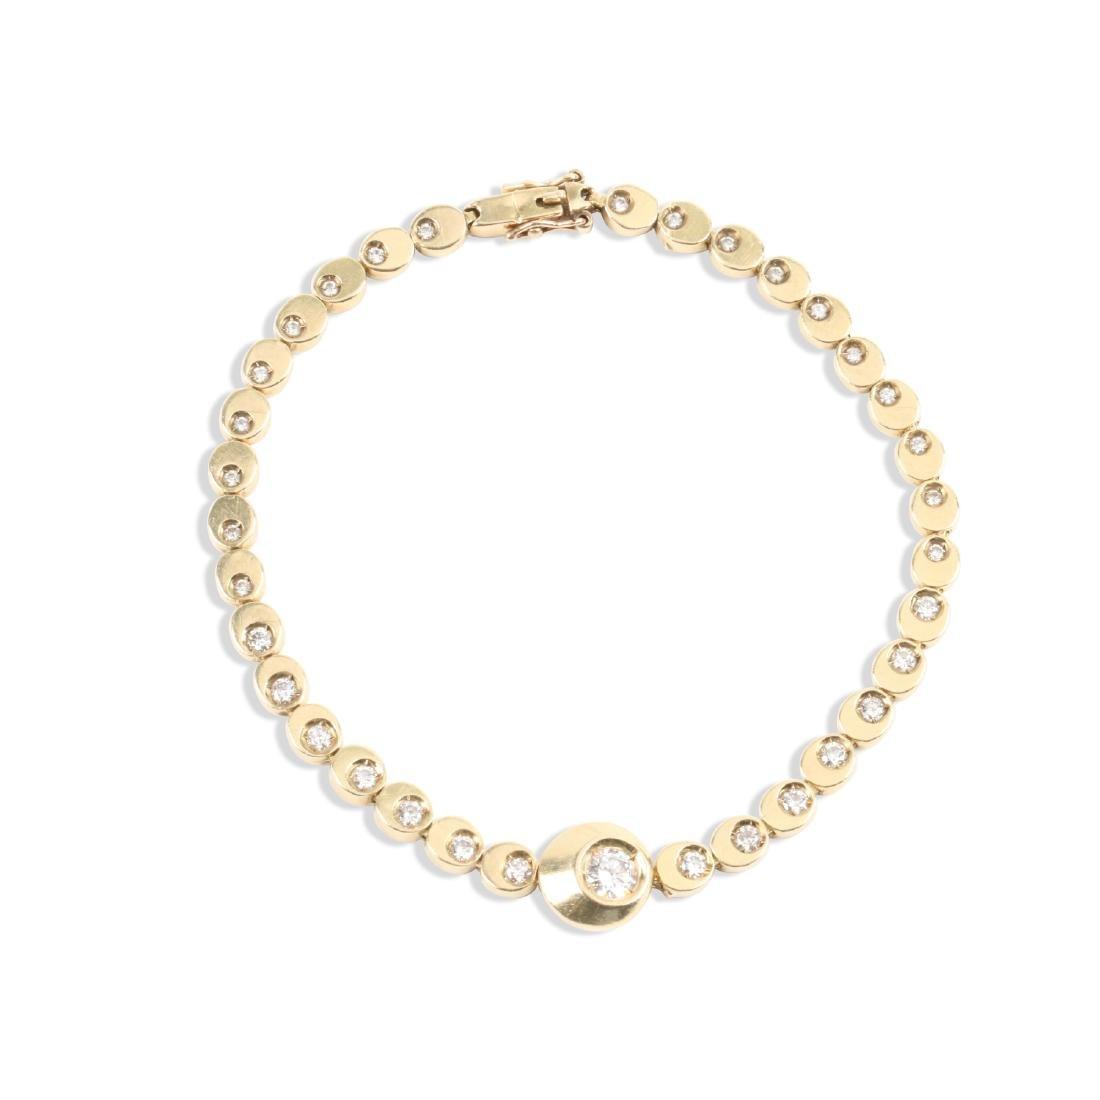 A 14K Gold & Diamond Tennis Bracelet